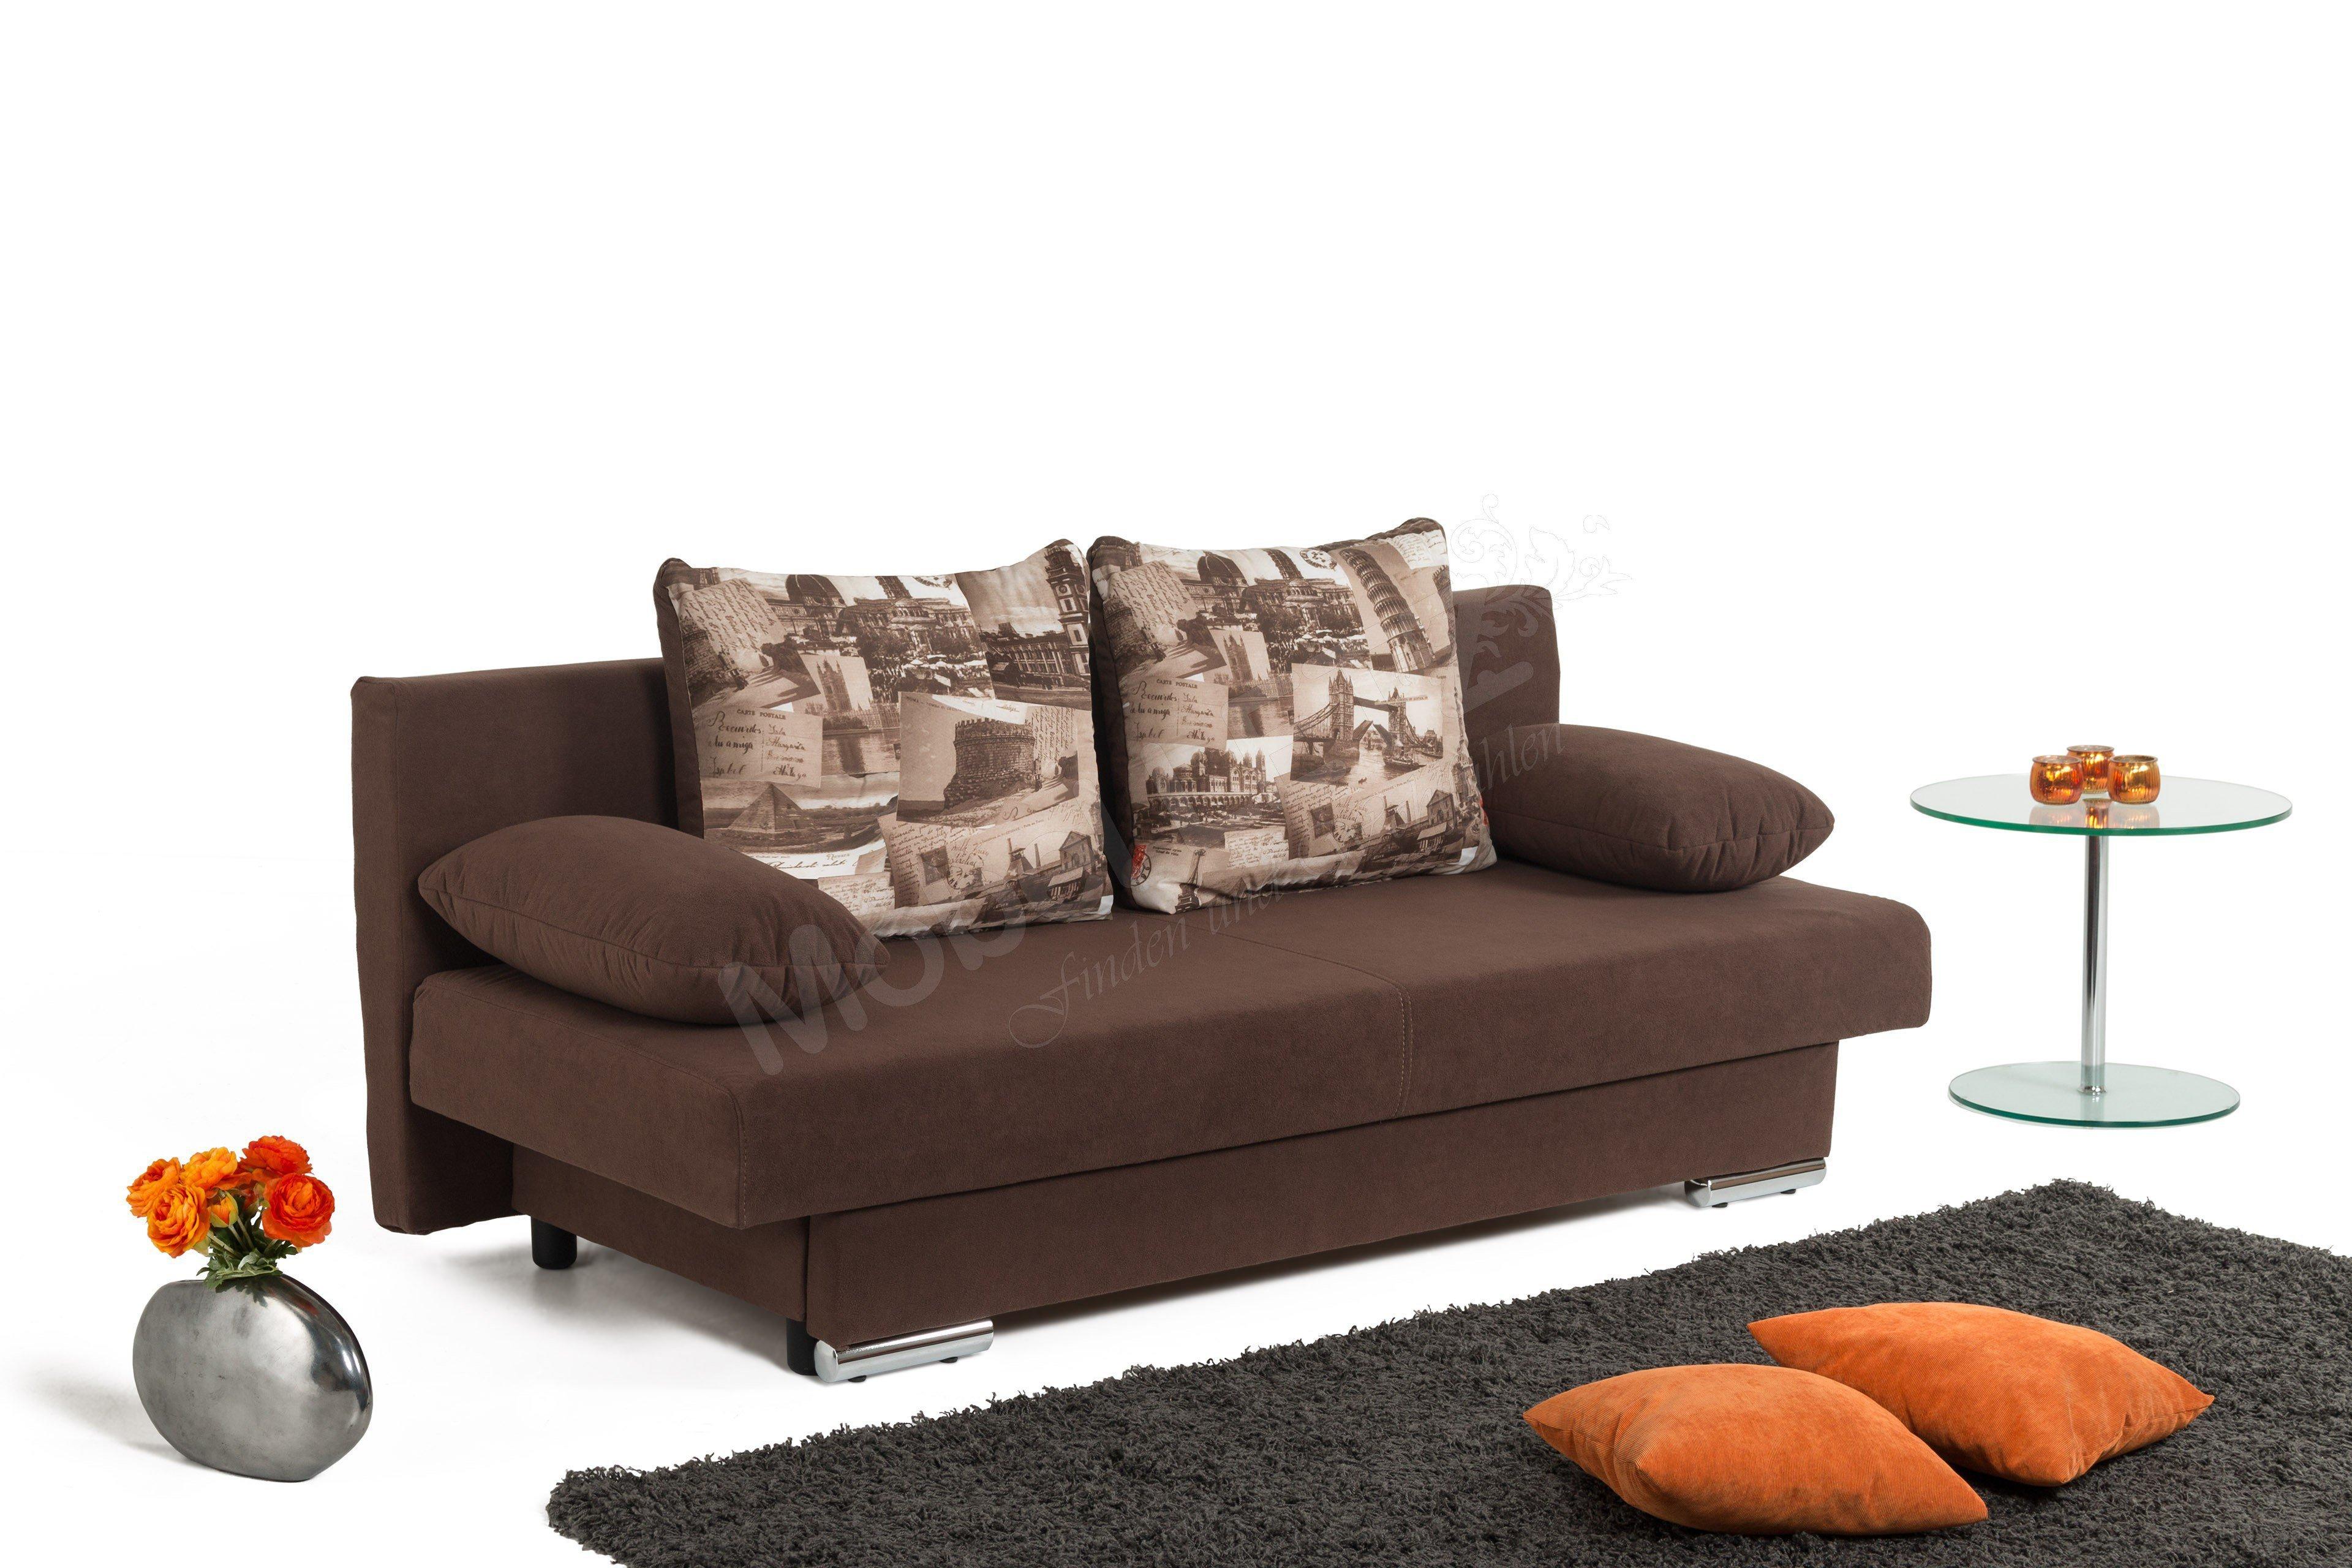 schlafsofa griffin angel jockenh fer in braun m bel letz ihr online shop. Black Bedroom Furniture Sets. Home Design Ideas